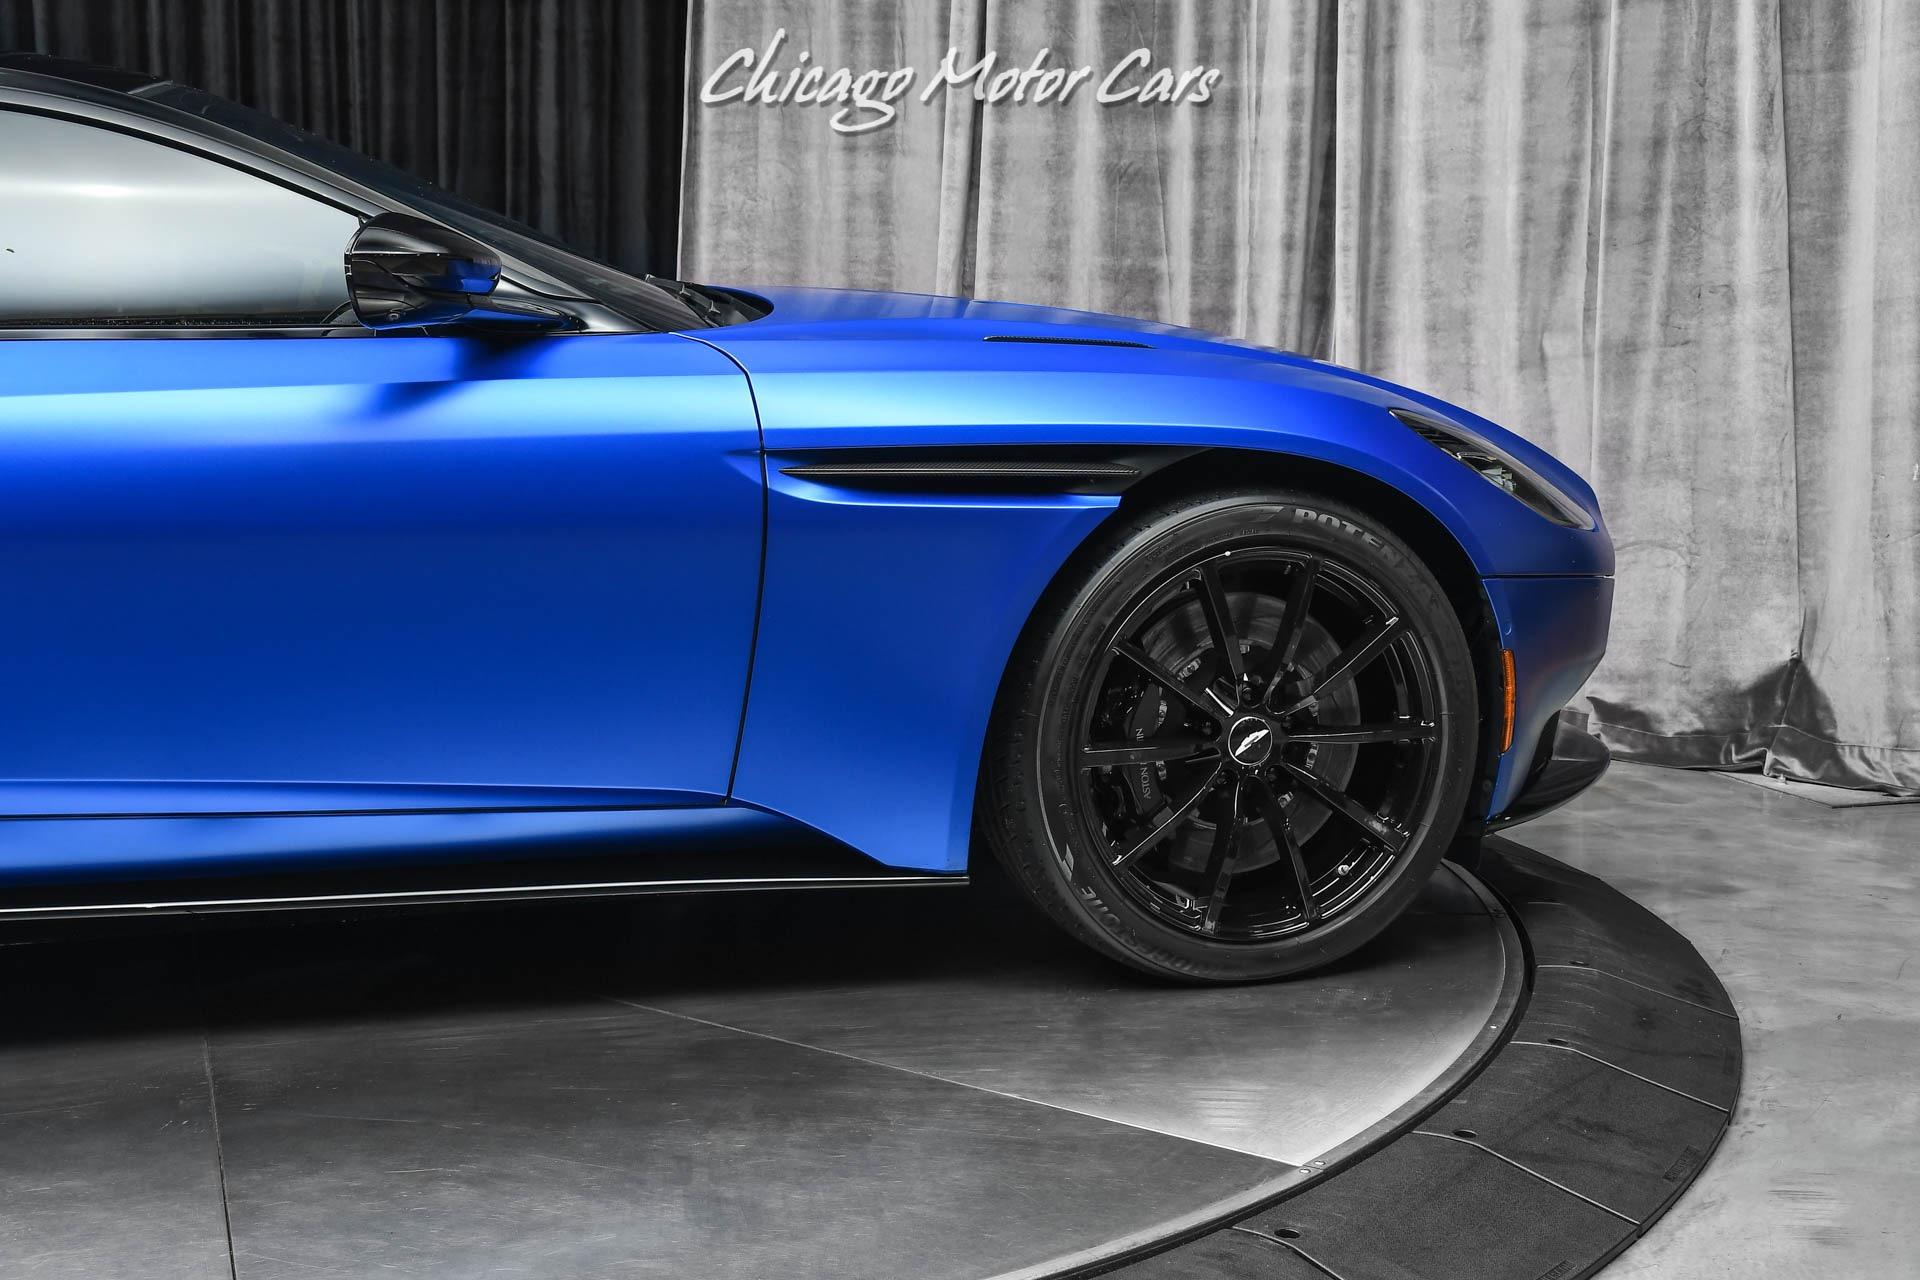 Used-2020-Aston-Martin-DB11-Coupe-AMR-V12-Stealth-PPF-B-O-Surround-Sound-Carbon-Fiber-LOADED